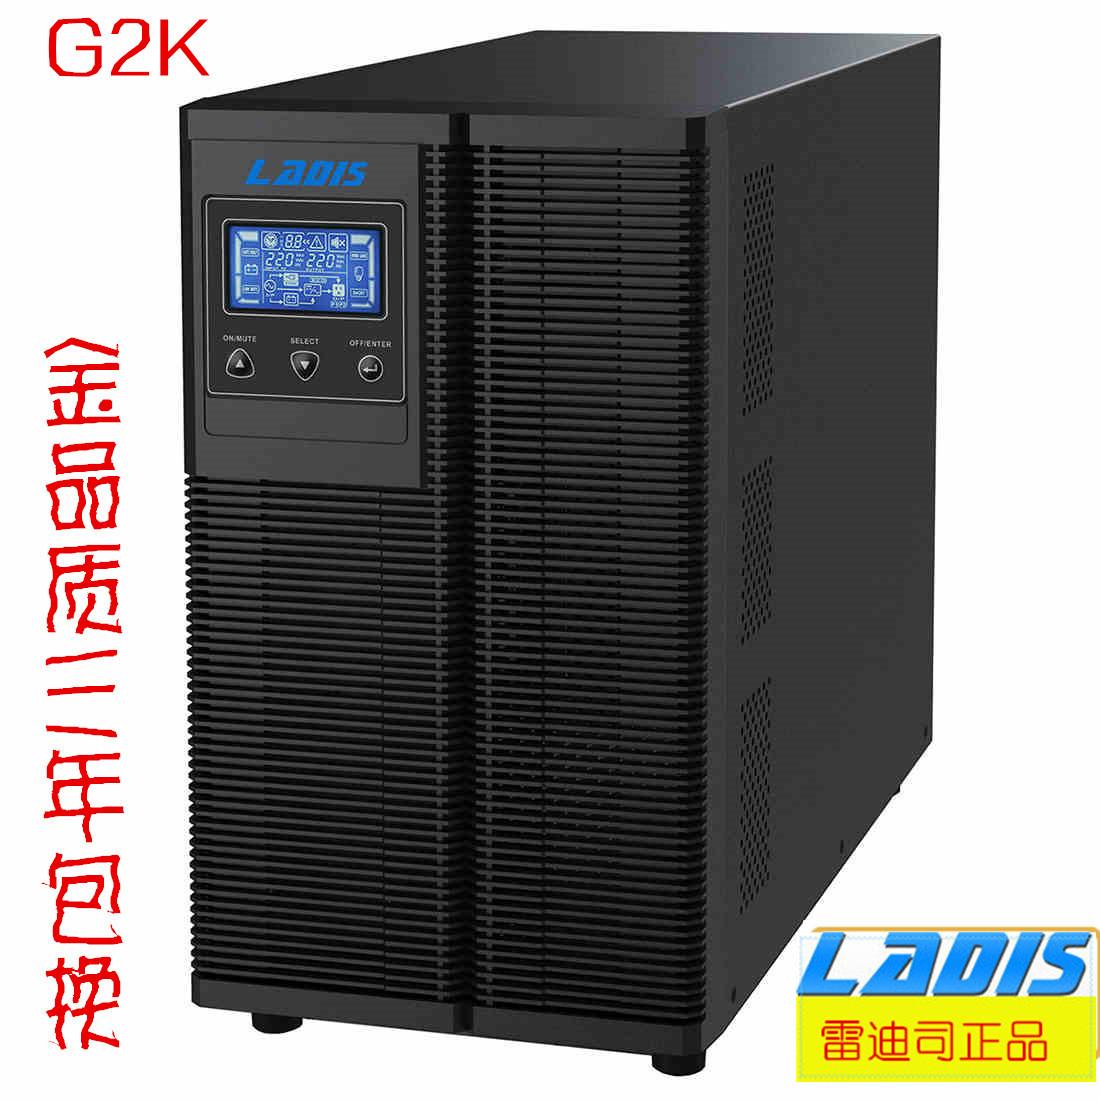 UPS UPS uninterruptible power supply G2K online 2000VA1600W Online